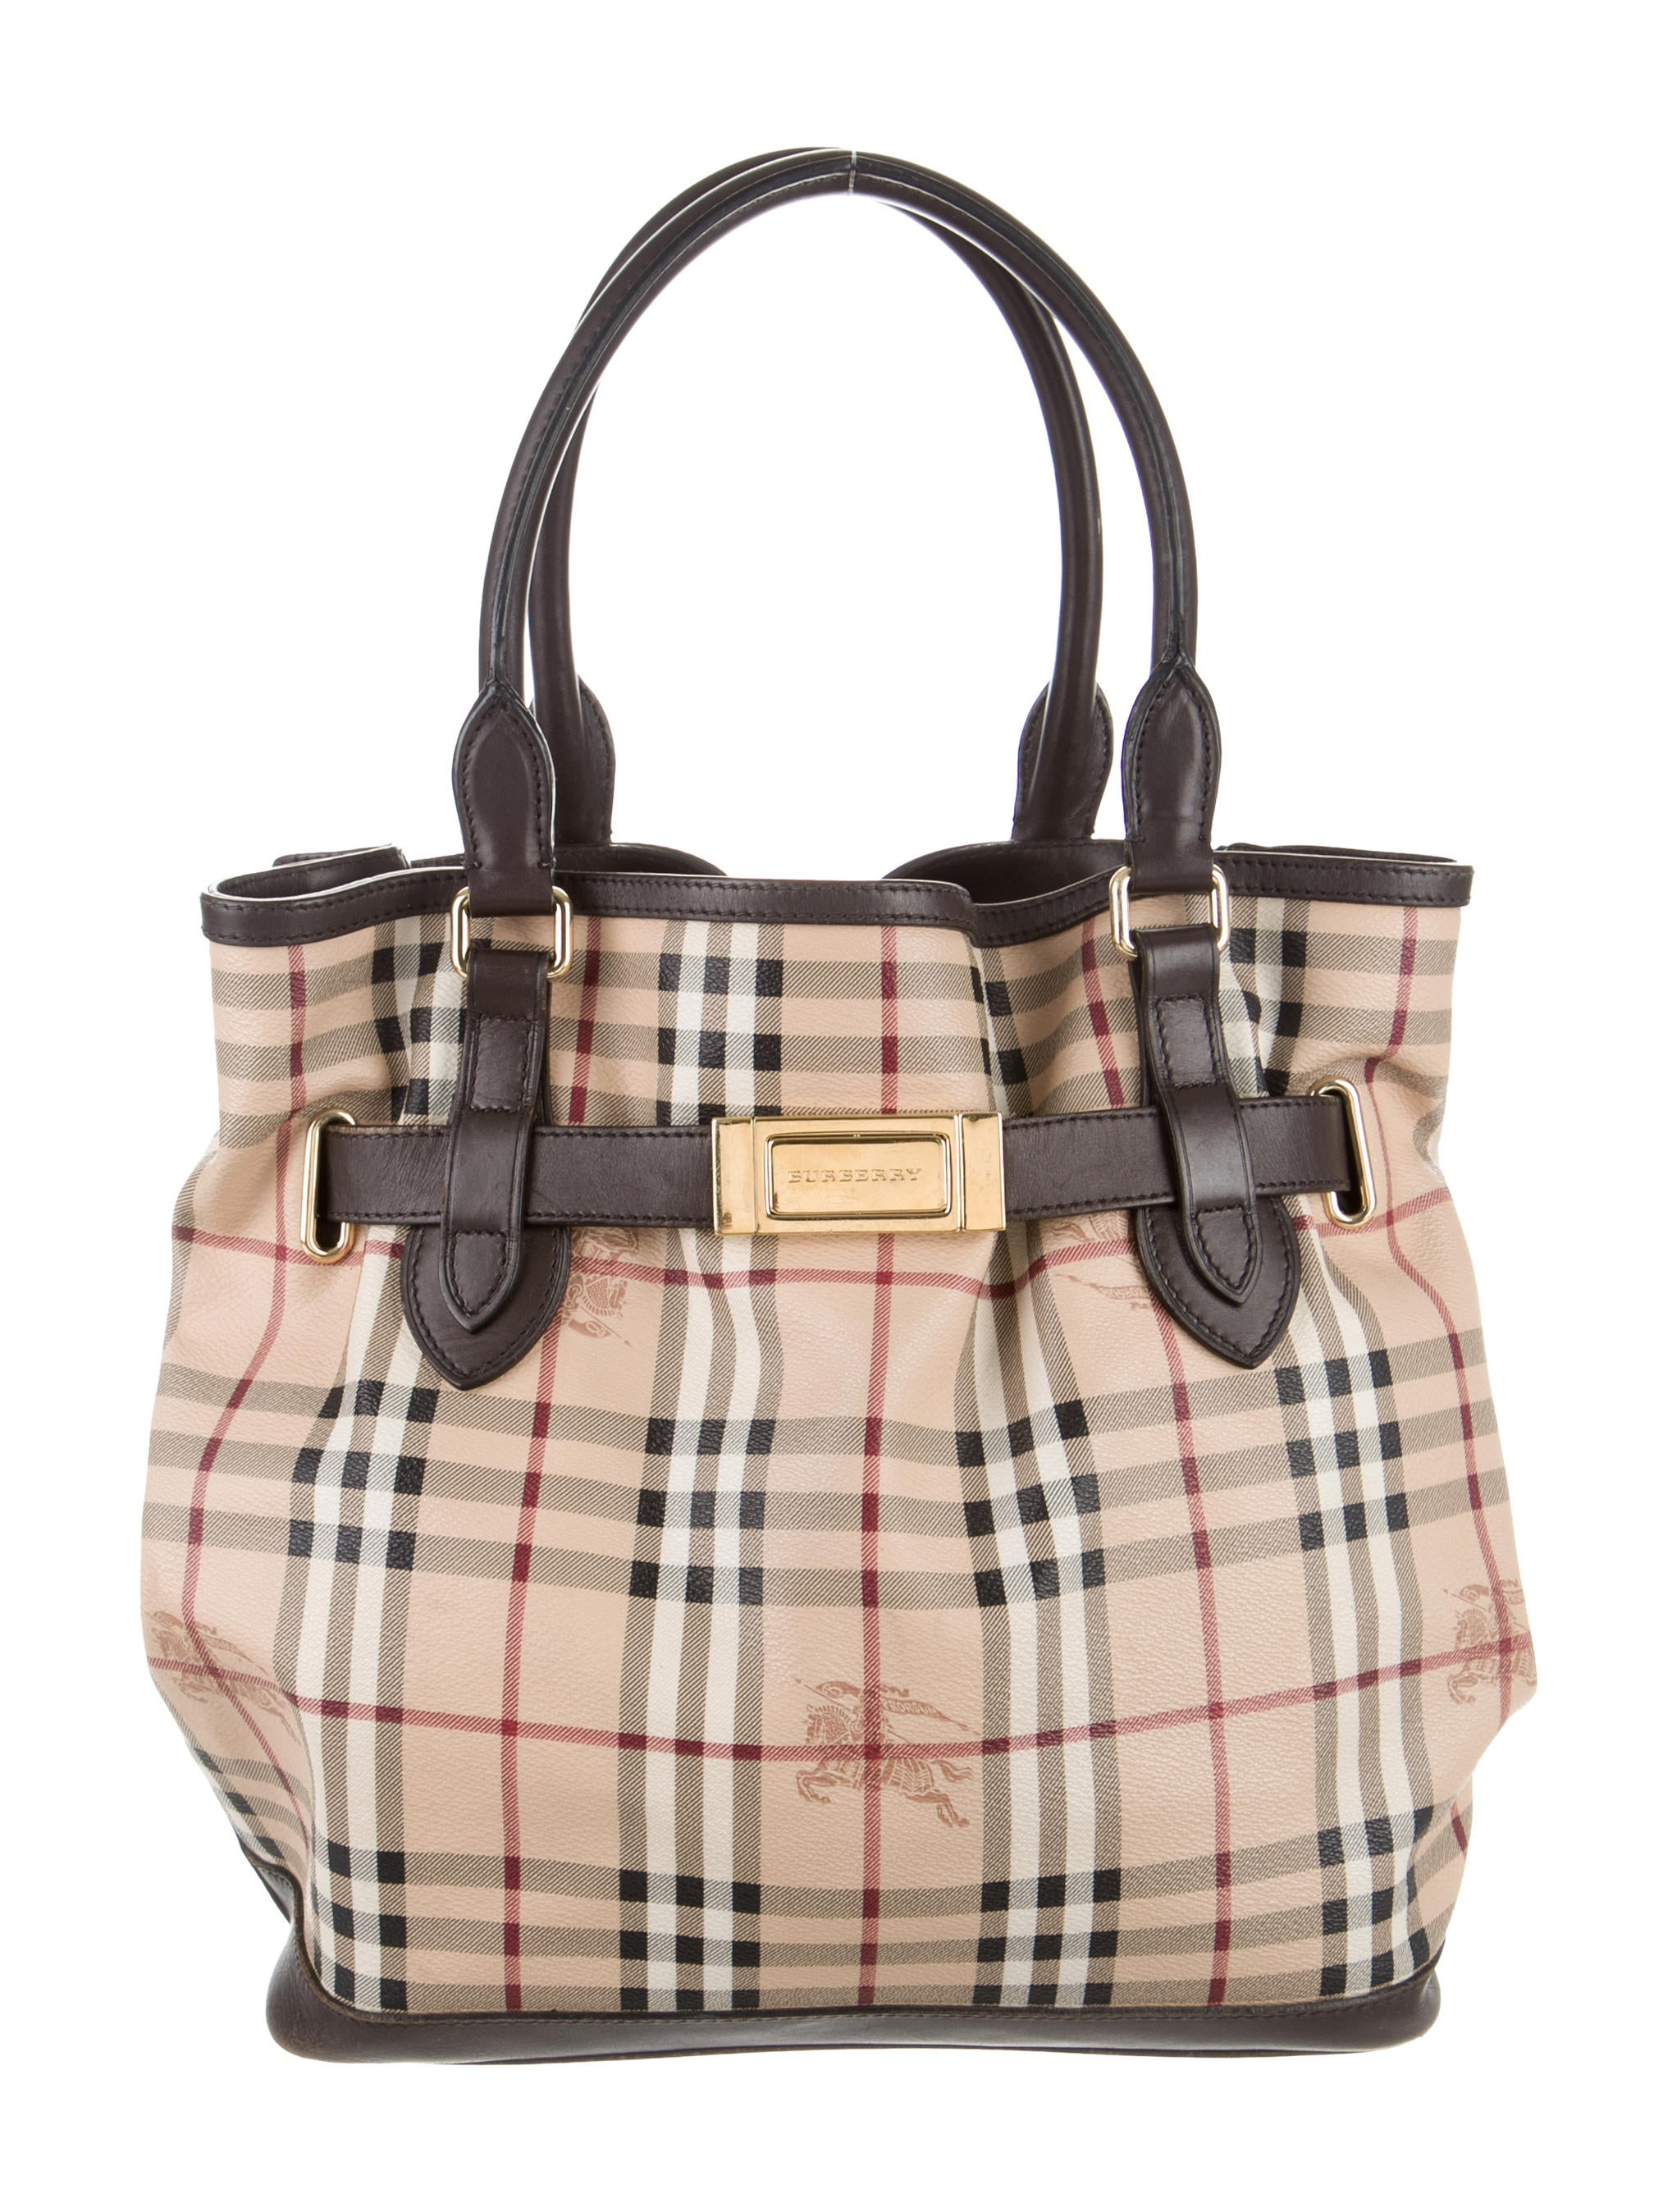 9d5250fd8221 Burberry Haymarket Medium Golderton Tote - Handbags - BUR50858